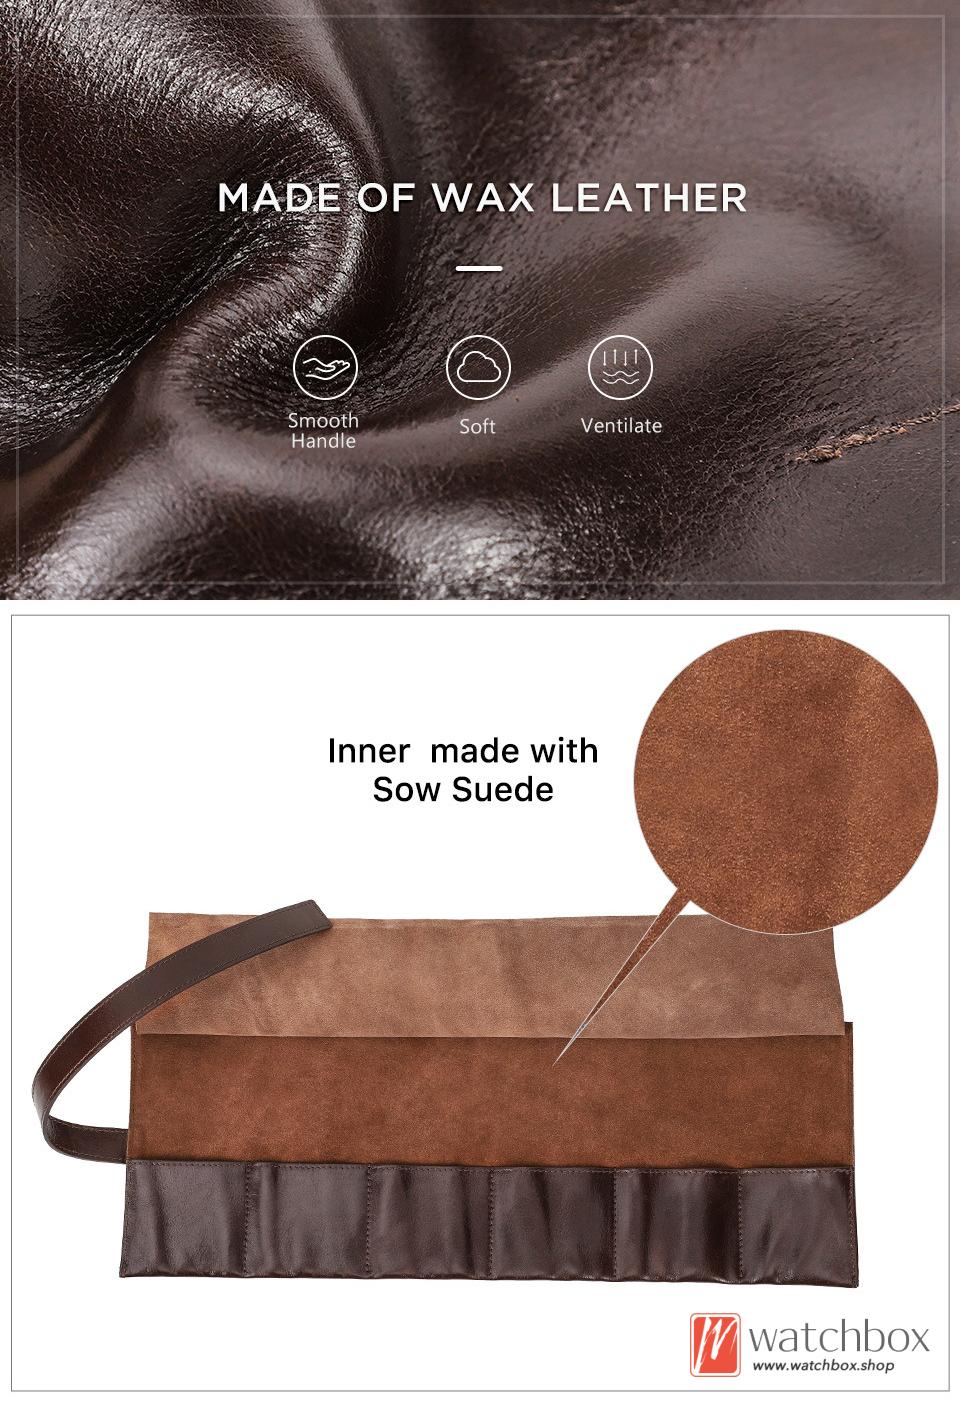 new vintage geunine wax leather 6 pockets watch case storage travel roll tied up bag organizer box